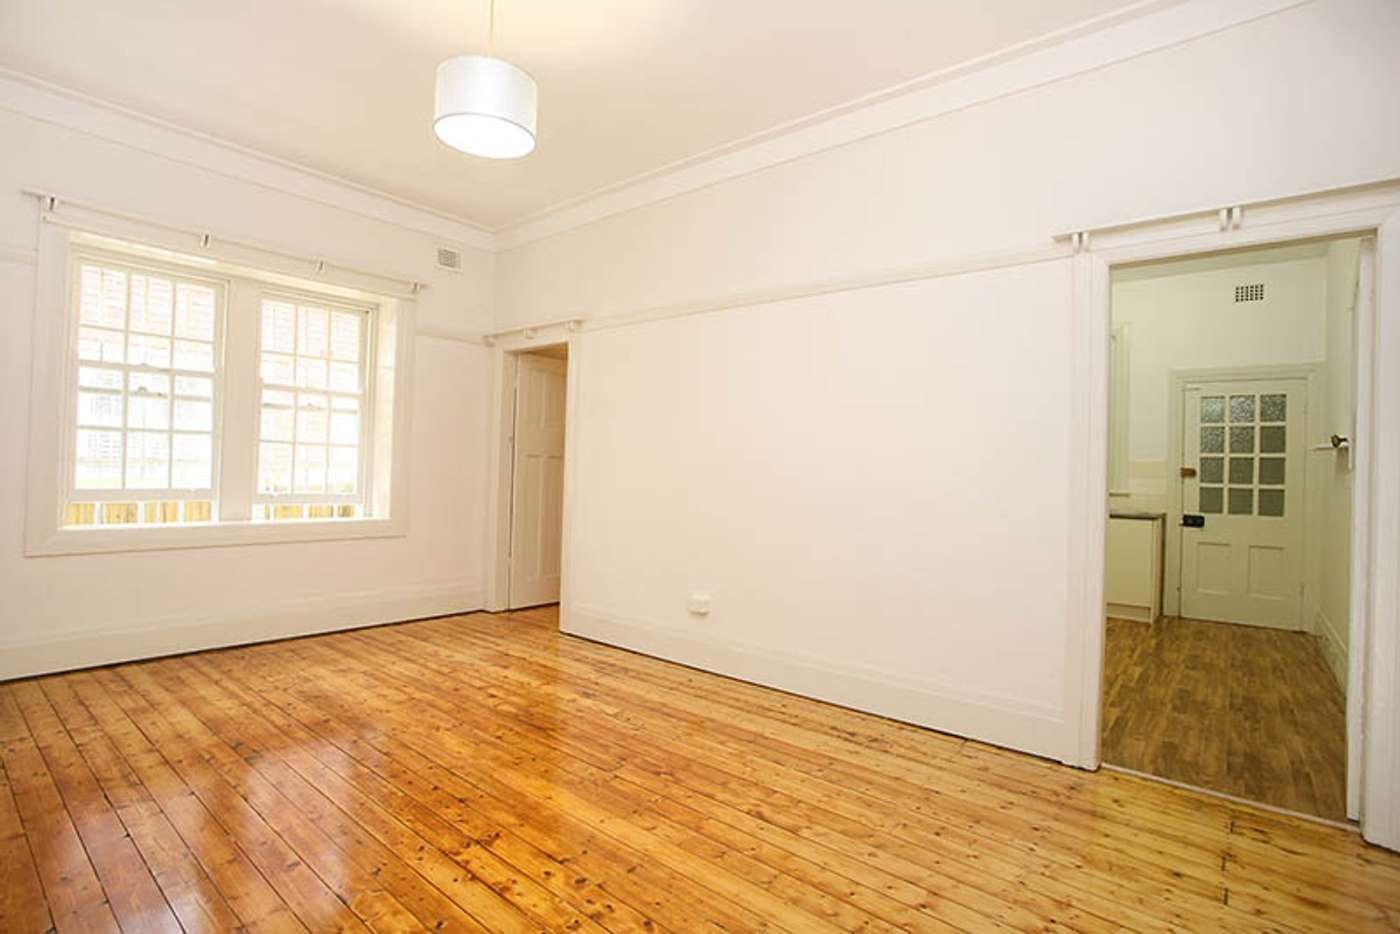 Main view of Homely apartment listing, 1/52 Sir Thomas Mitchell Road, Bondi Beach NSW 2026